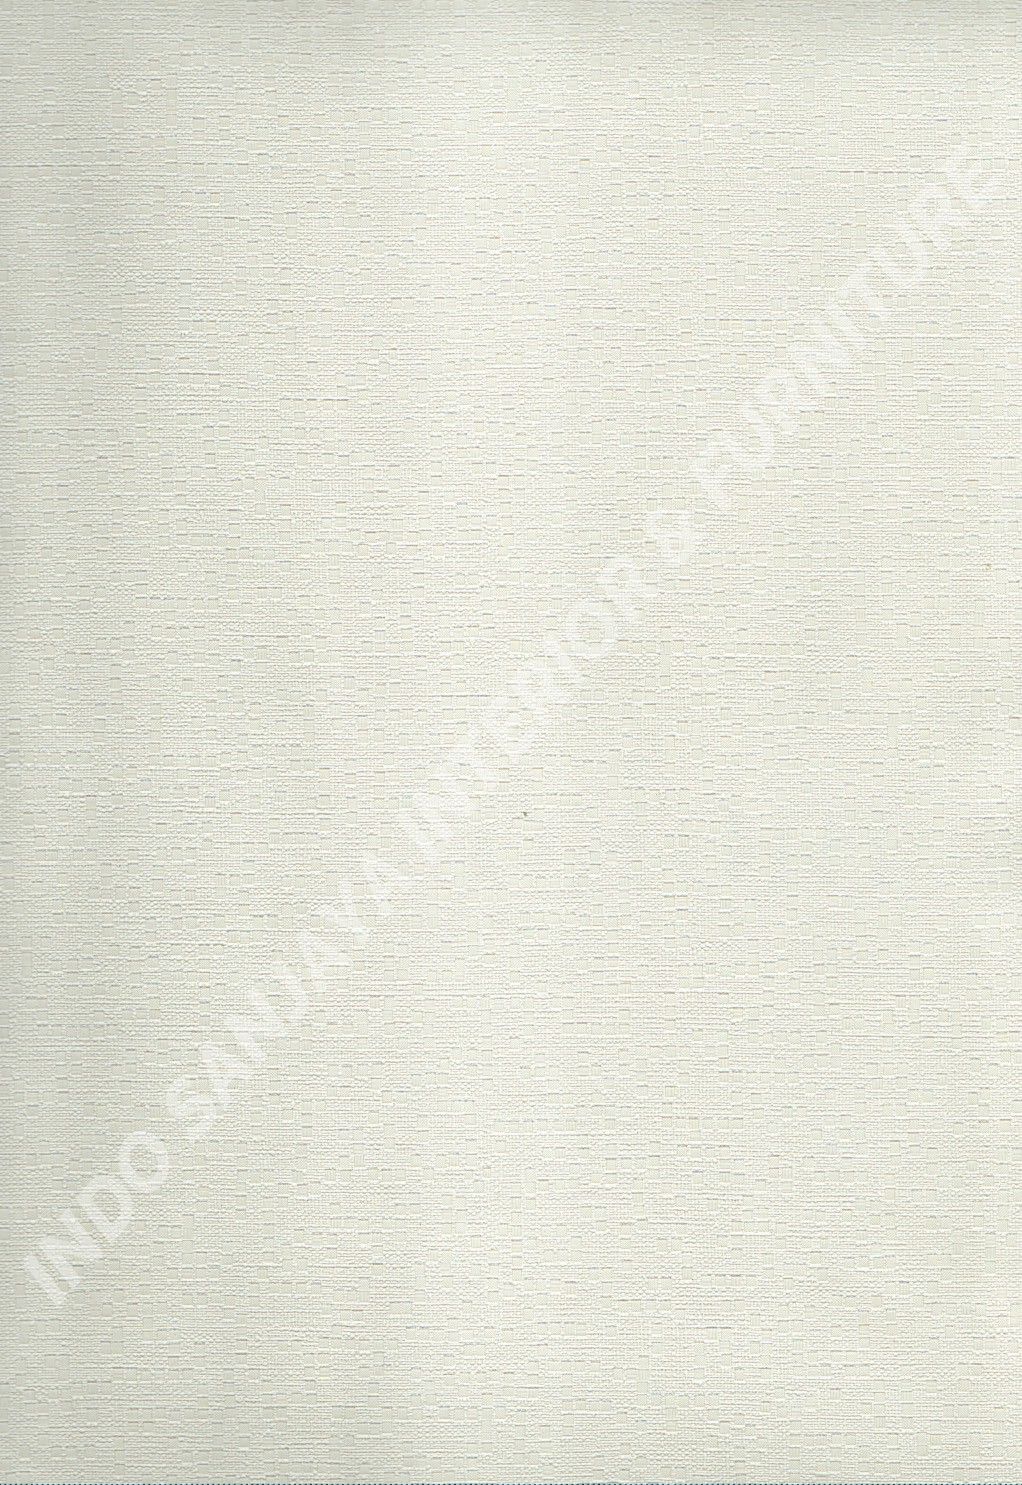 wallpaper   Wallpaper Minimalis Polos 3062:3062 corak  warna